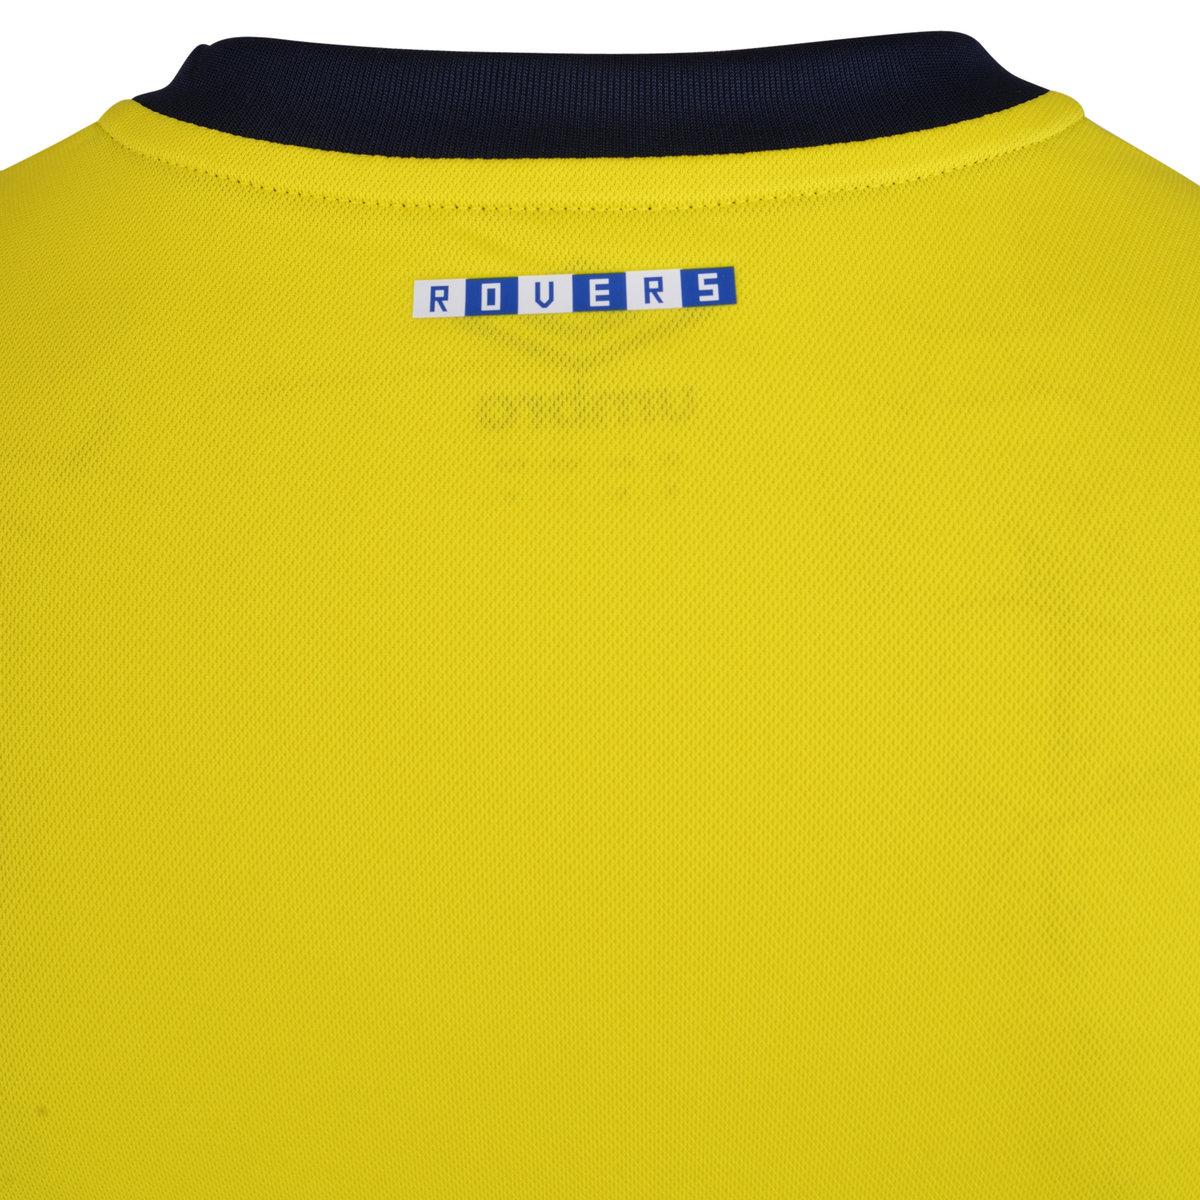 BLACKBURN ROVERS 18 19 AWAY JERSEY - Blackburn Rovers FC - Umbro 7368c87fc